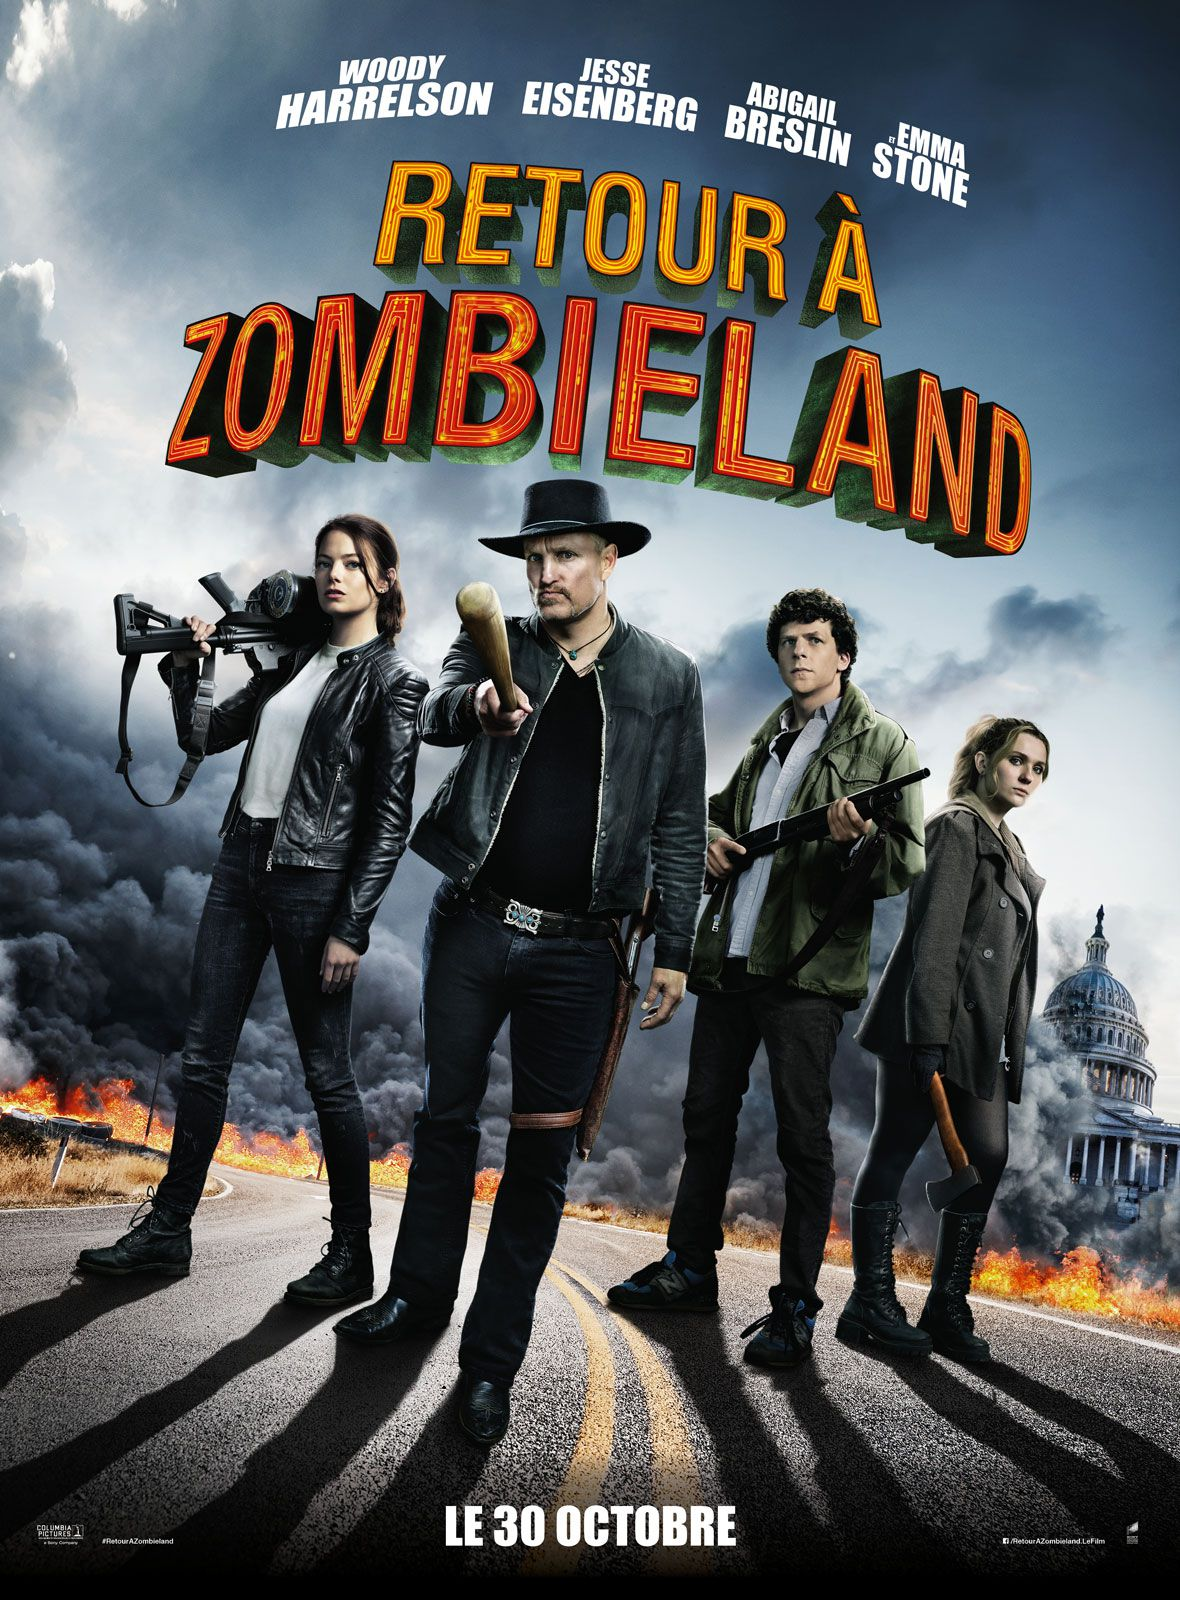 Retour à Zombieland - Film (2019)